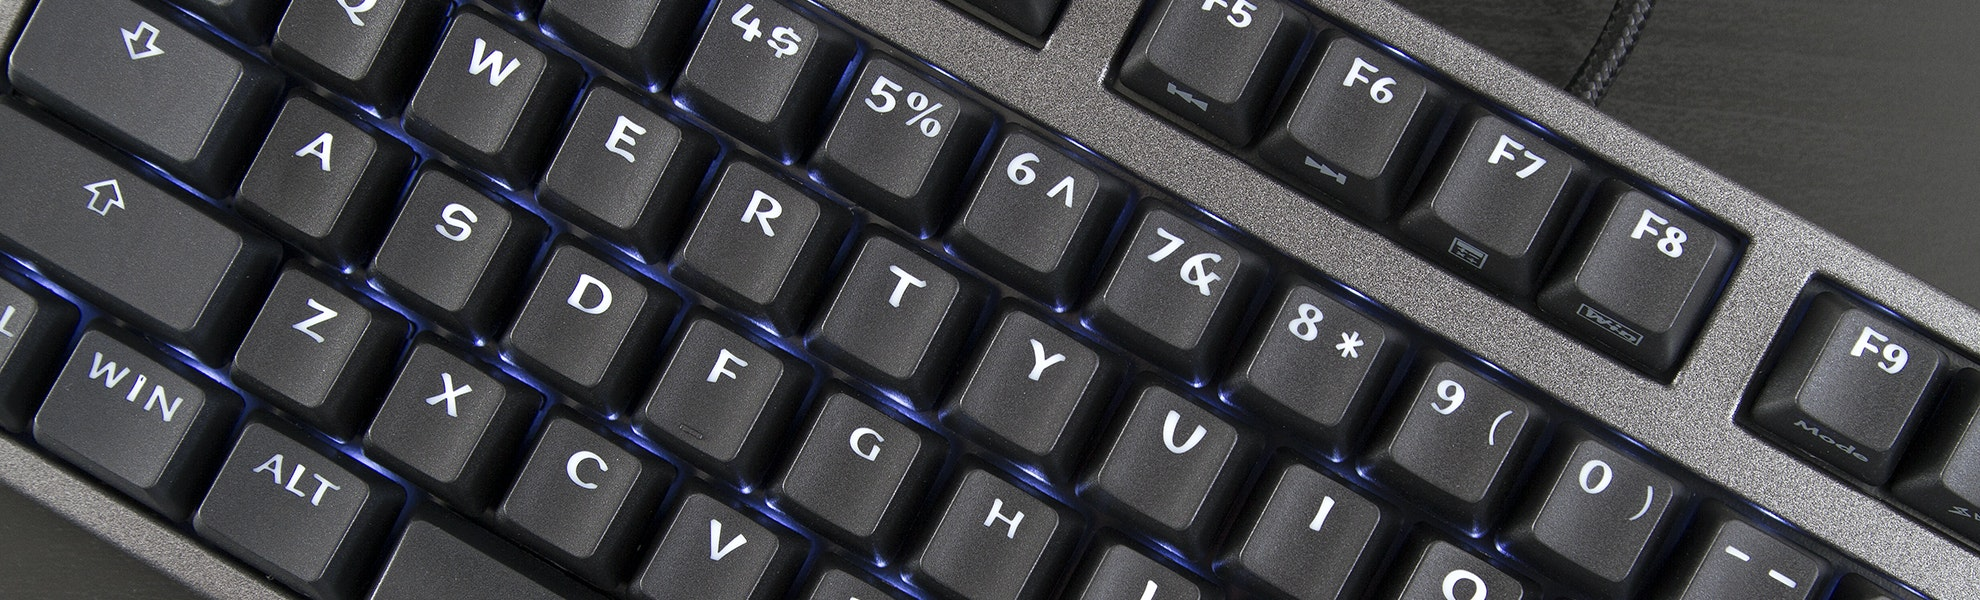 Deck 87 Francium Pro Mechanical Keyboard